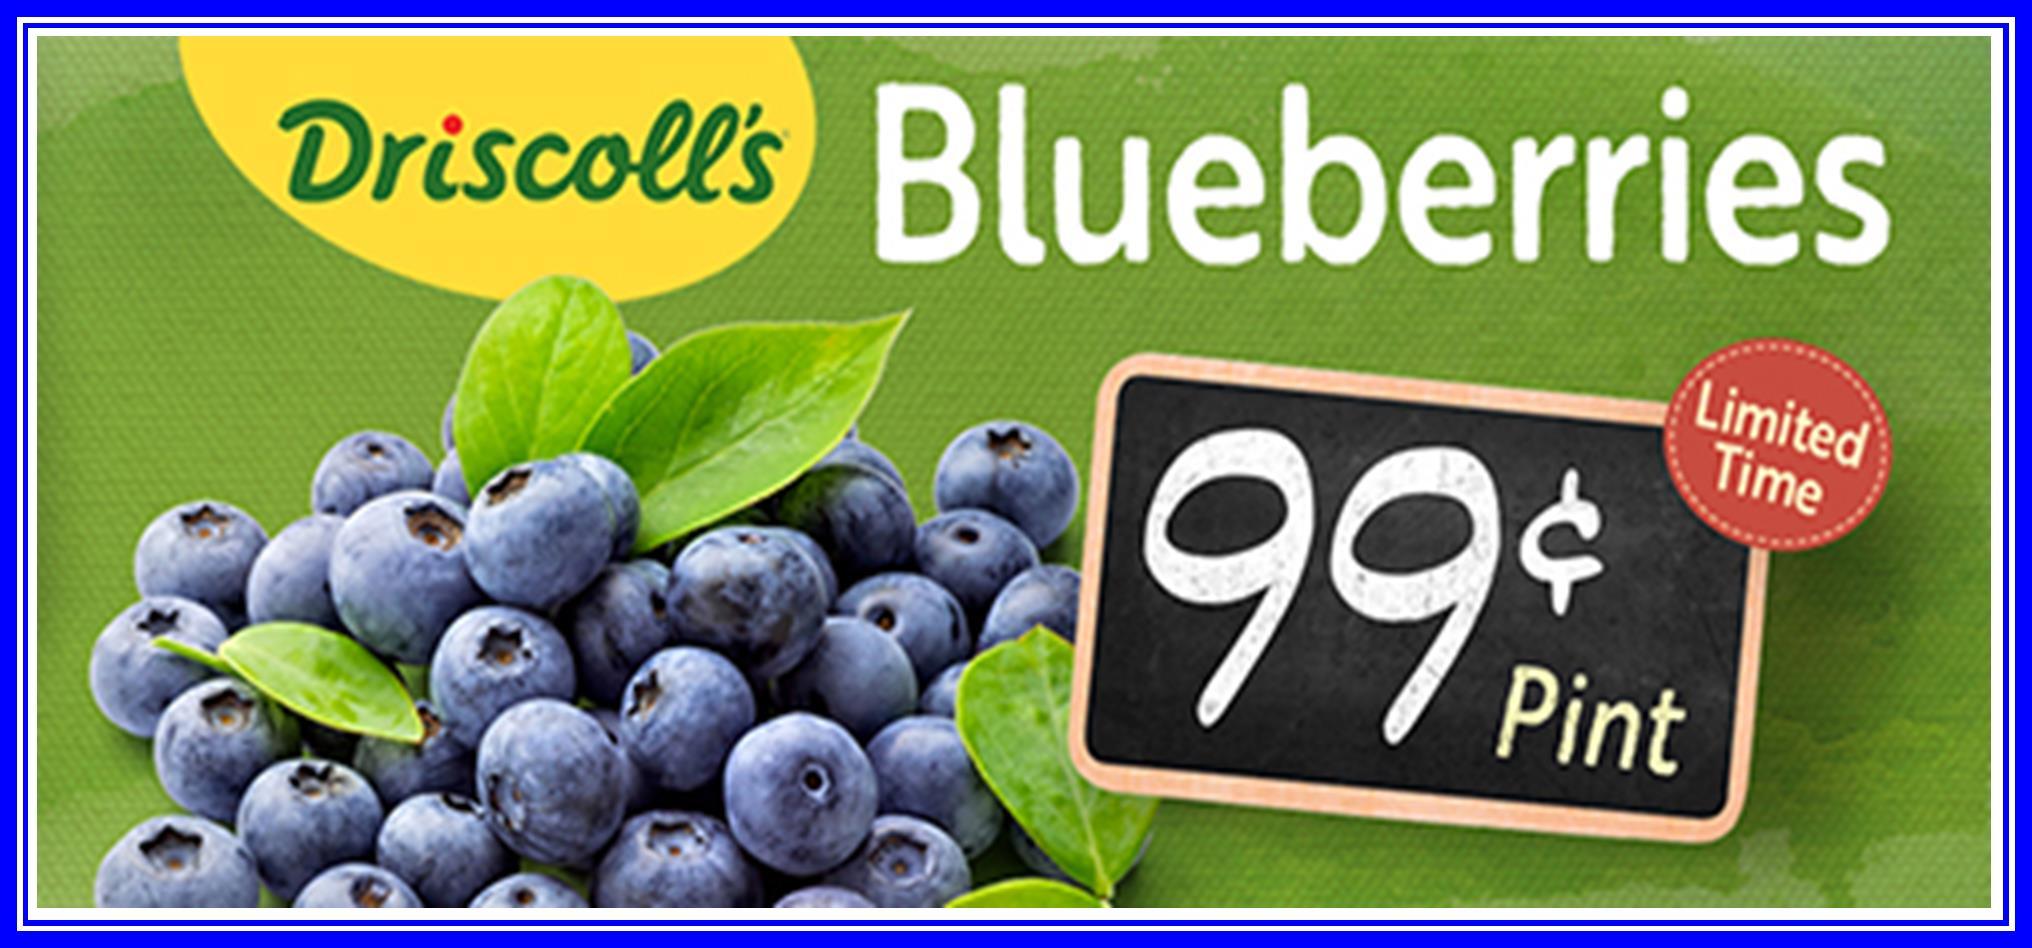 Blueberries Driscolls 99.jpg